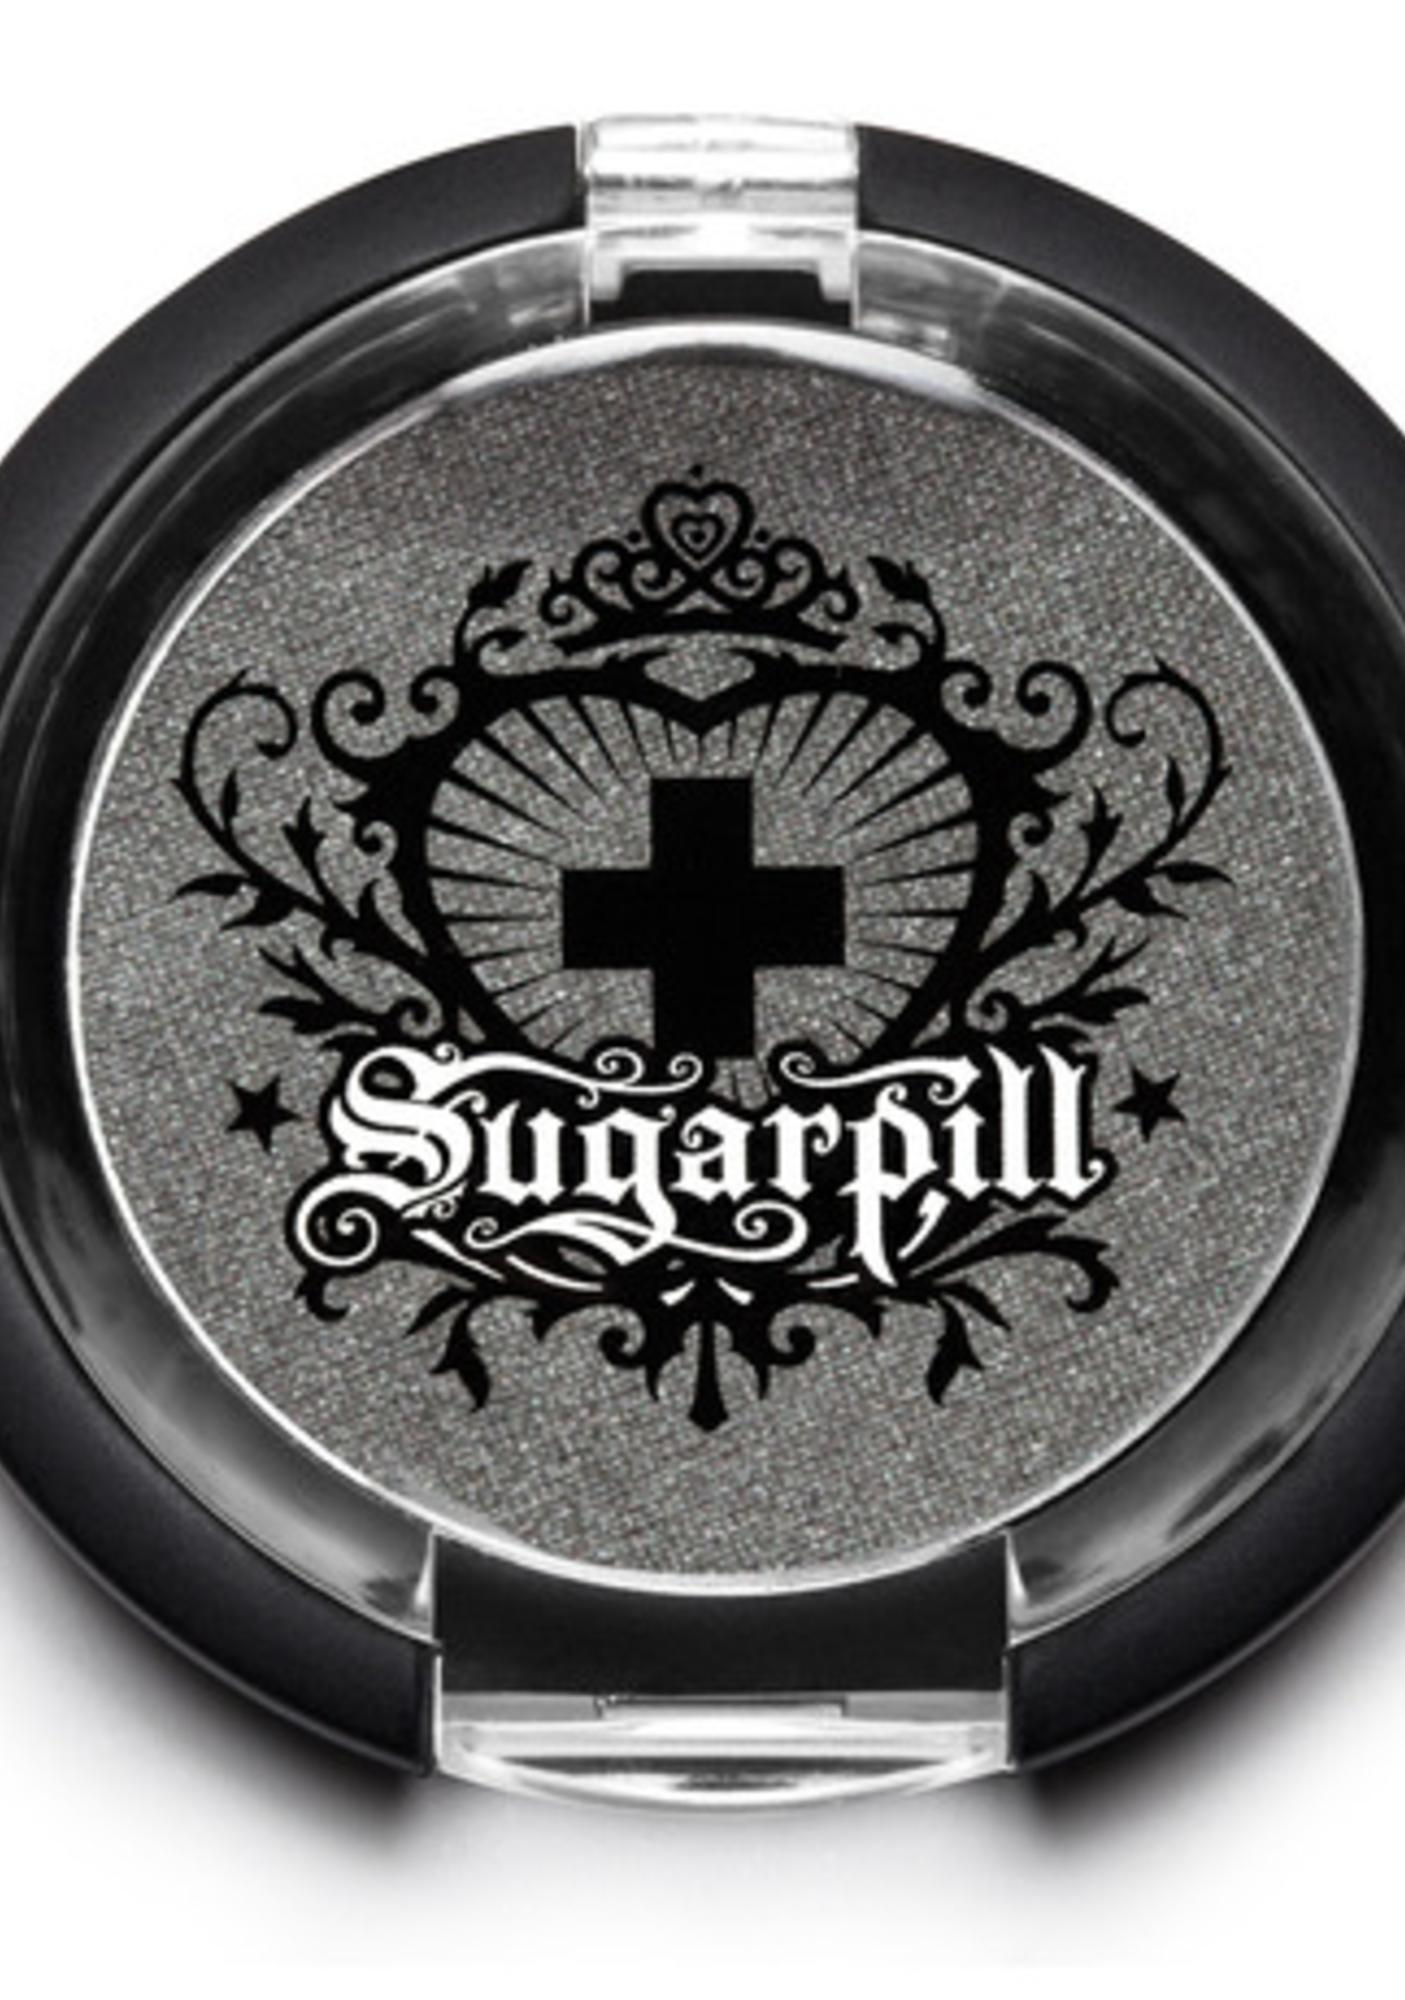 Sugarpill Soot & Stars Pressed Eyeshadow